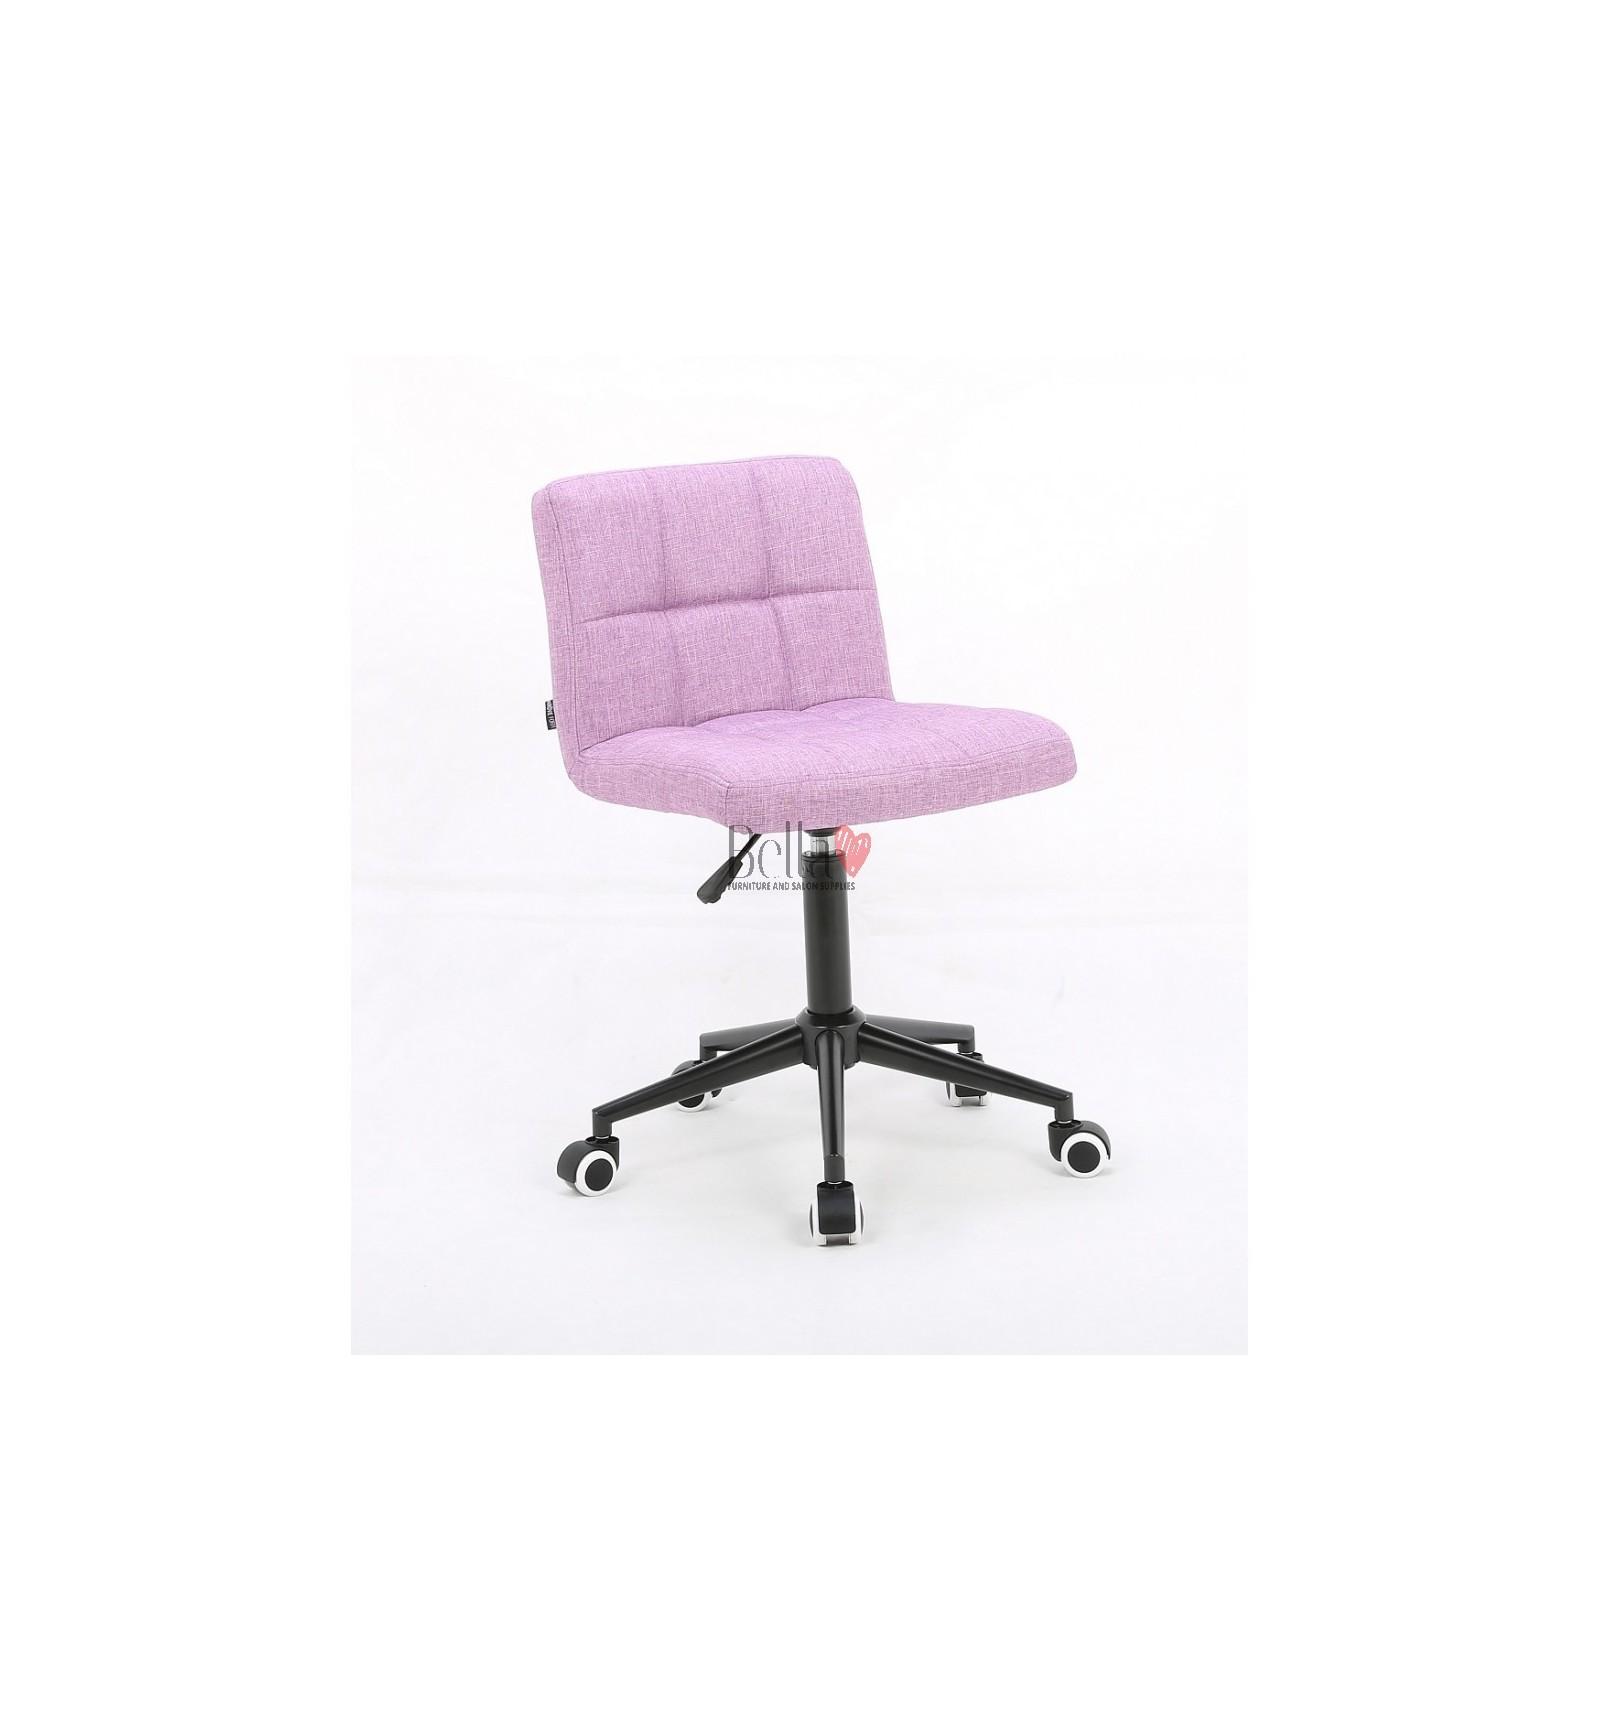 Elegant salon chairs with chromeblack base perfect for